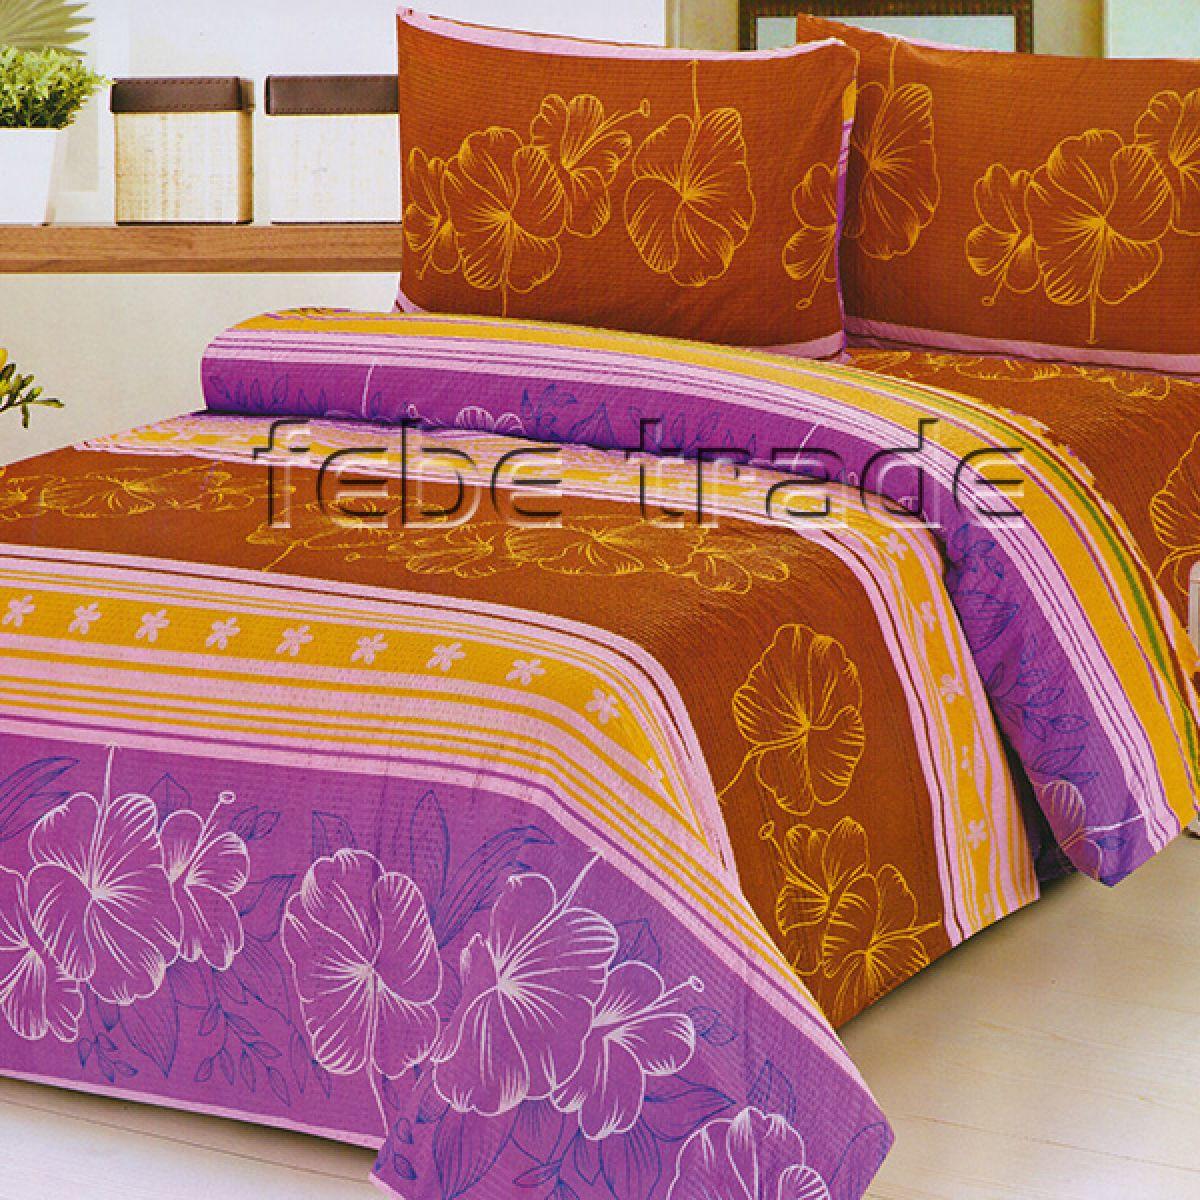 Cheap Beddings - TPR-YP-243 - 220x200cm - 4 pcs